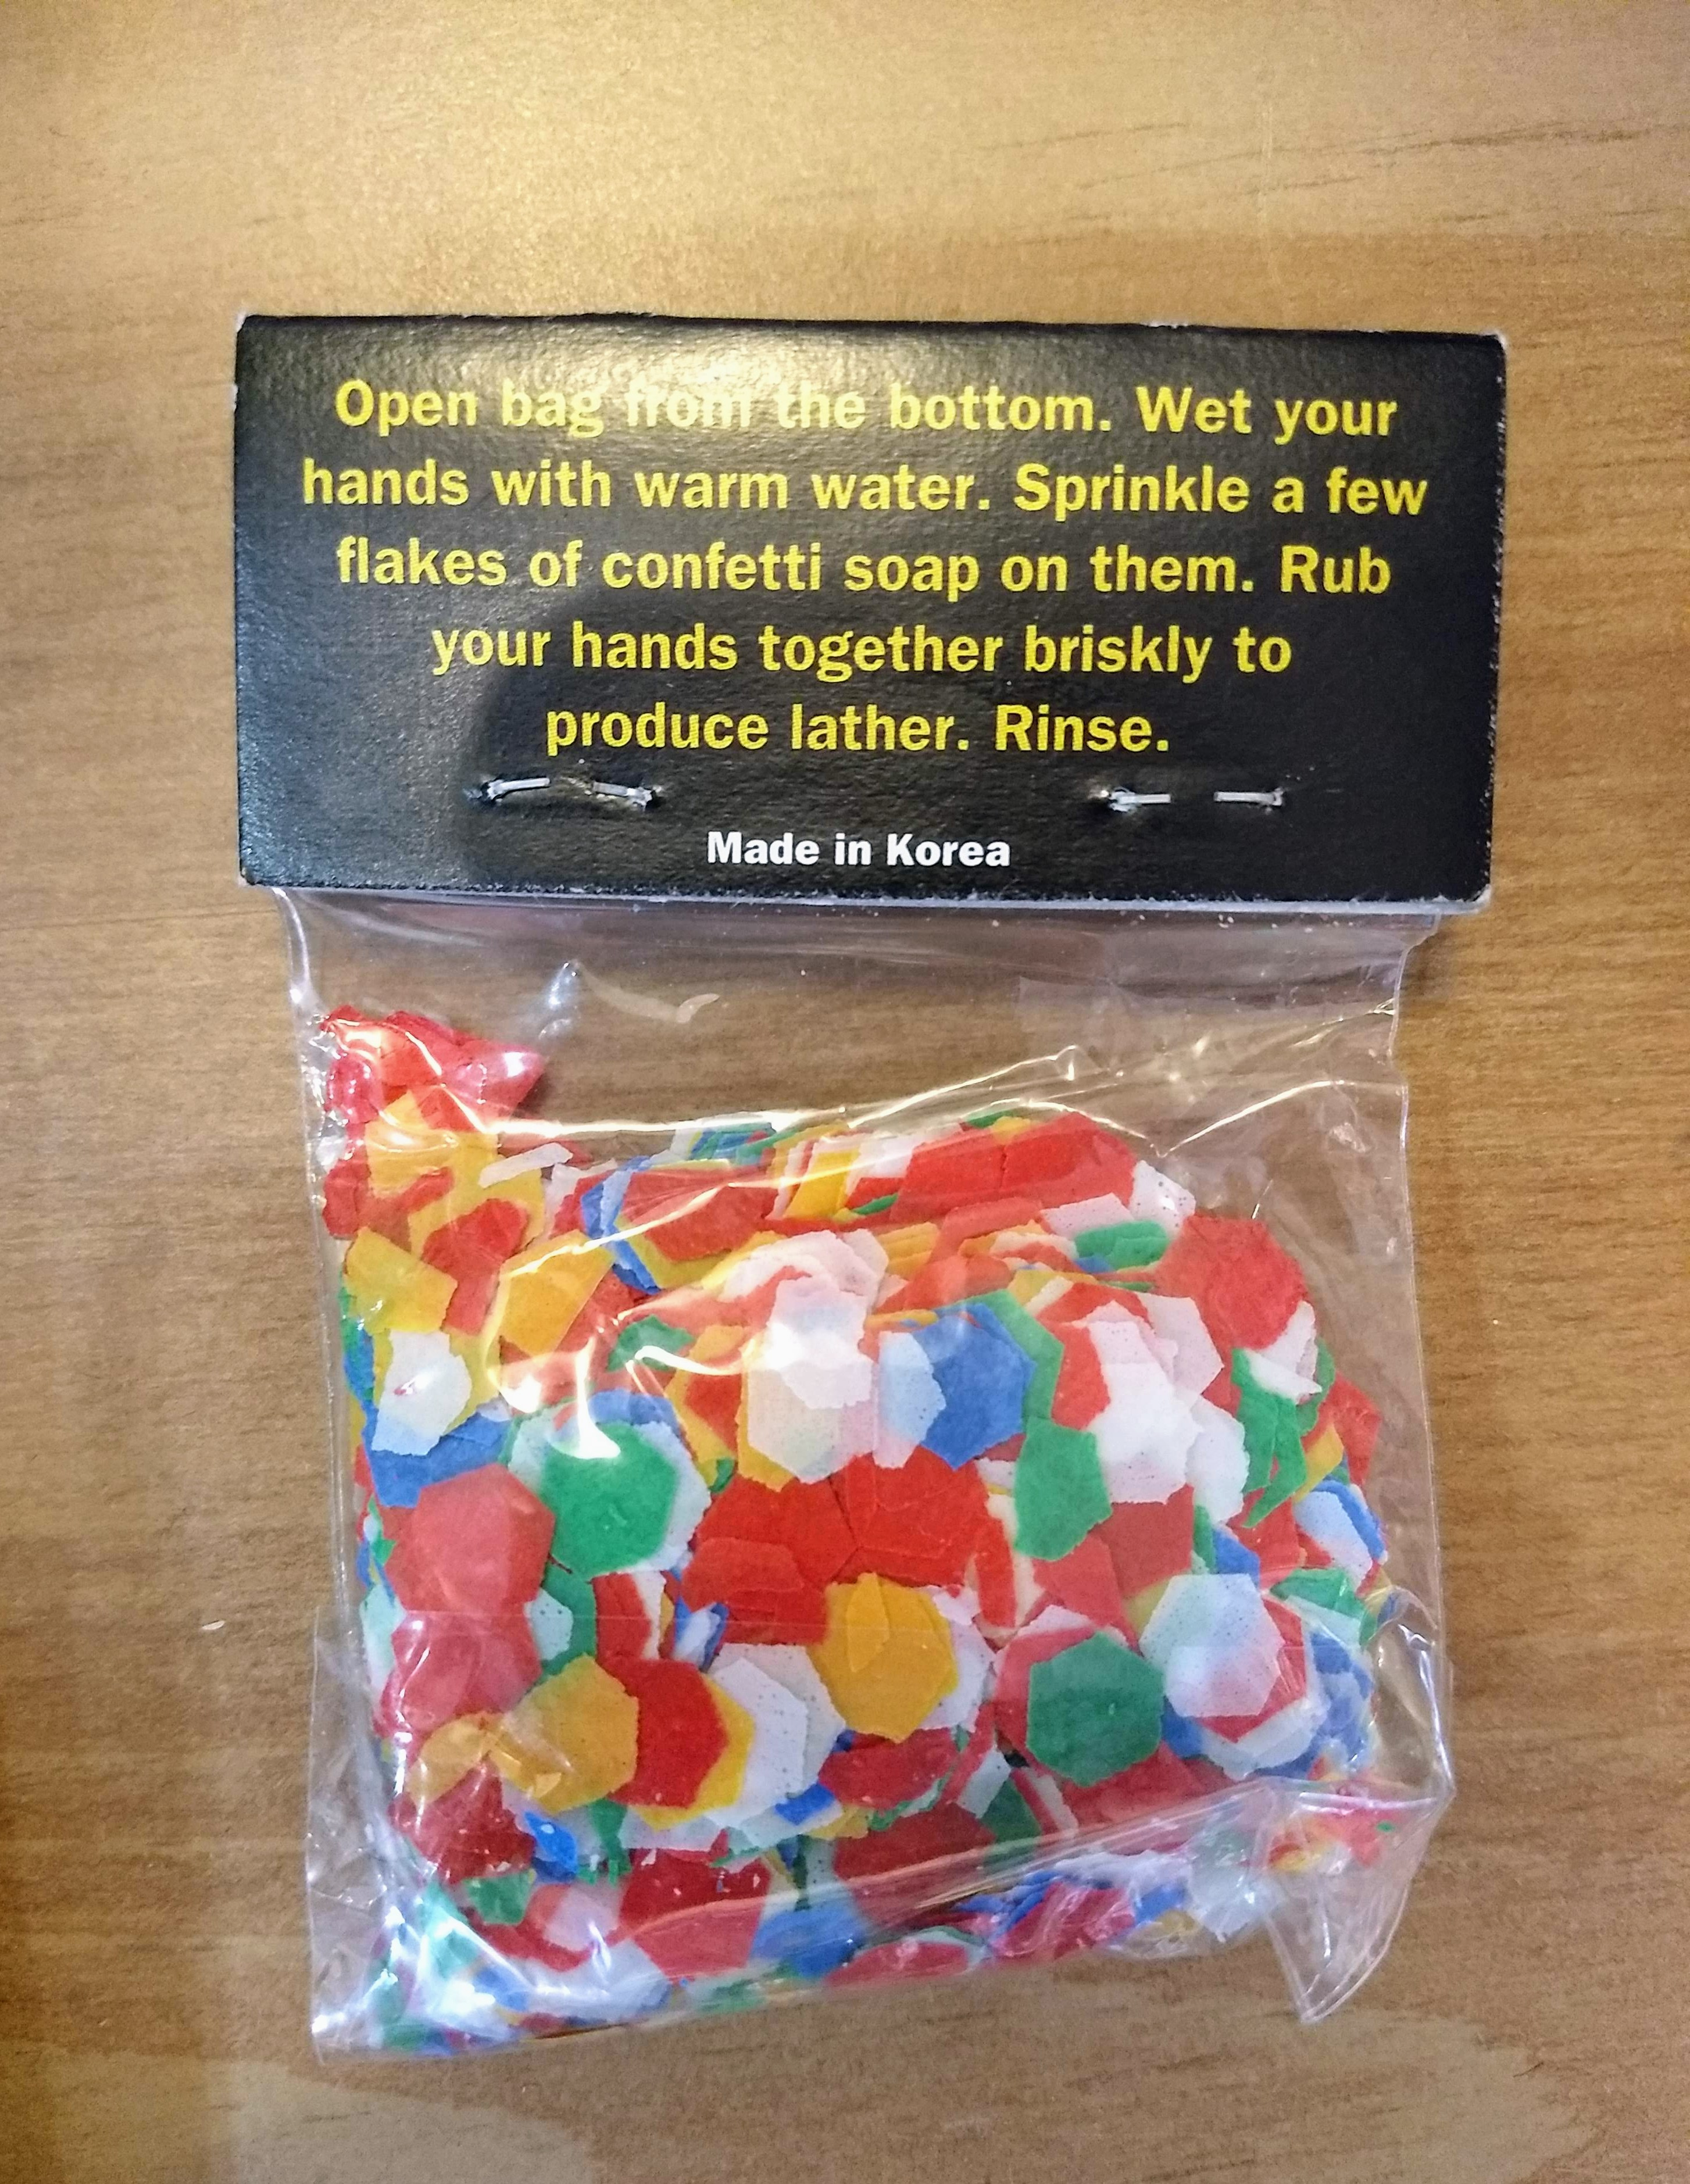 Slumber Party Kit Confetti Soap back.jpg